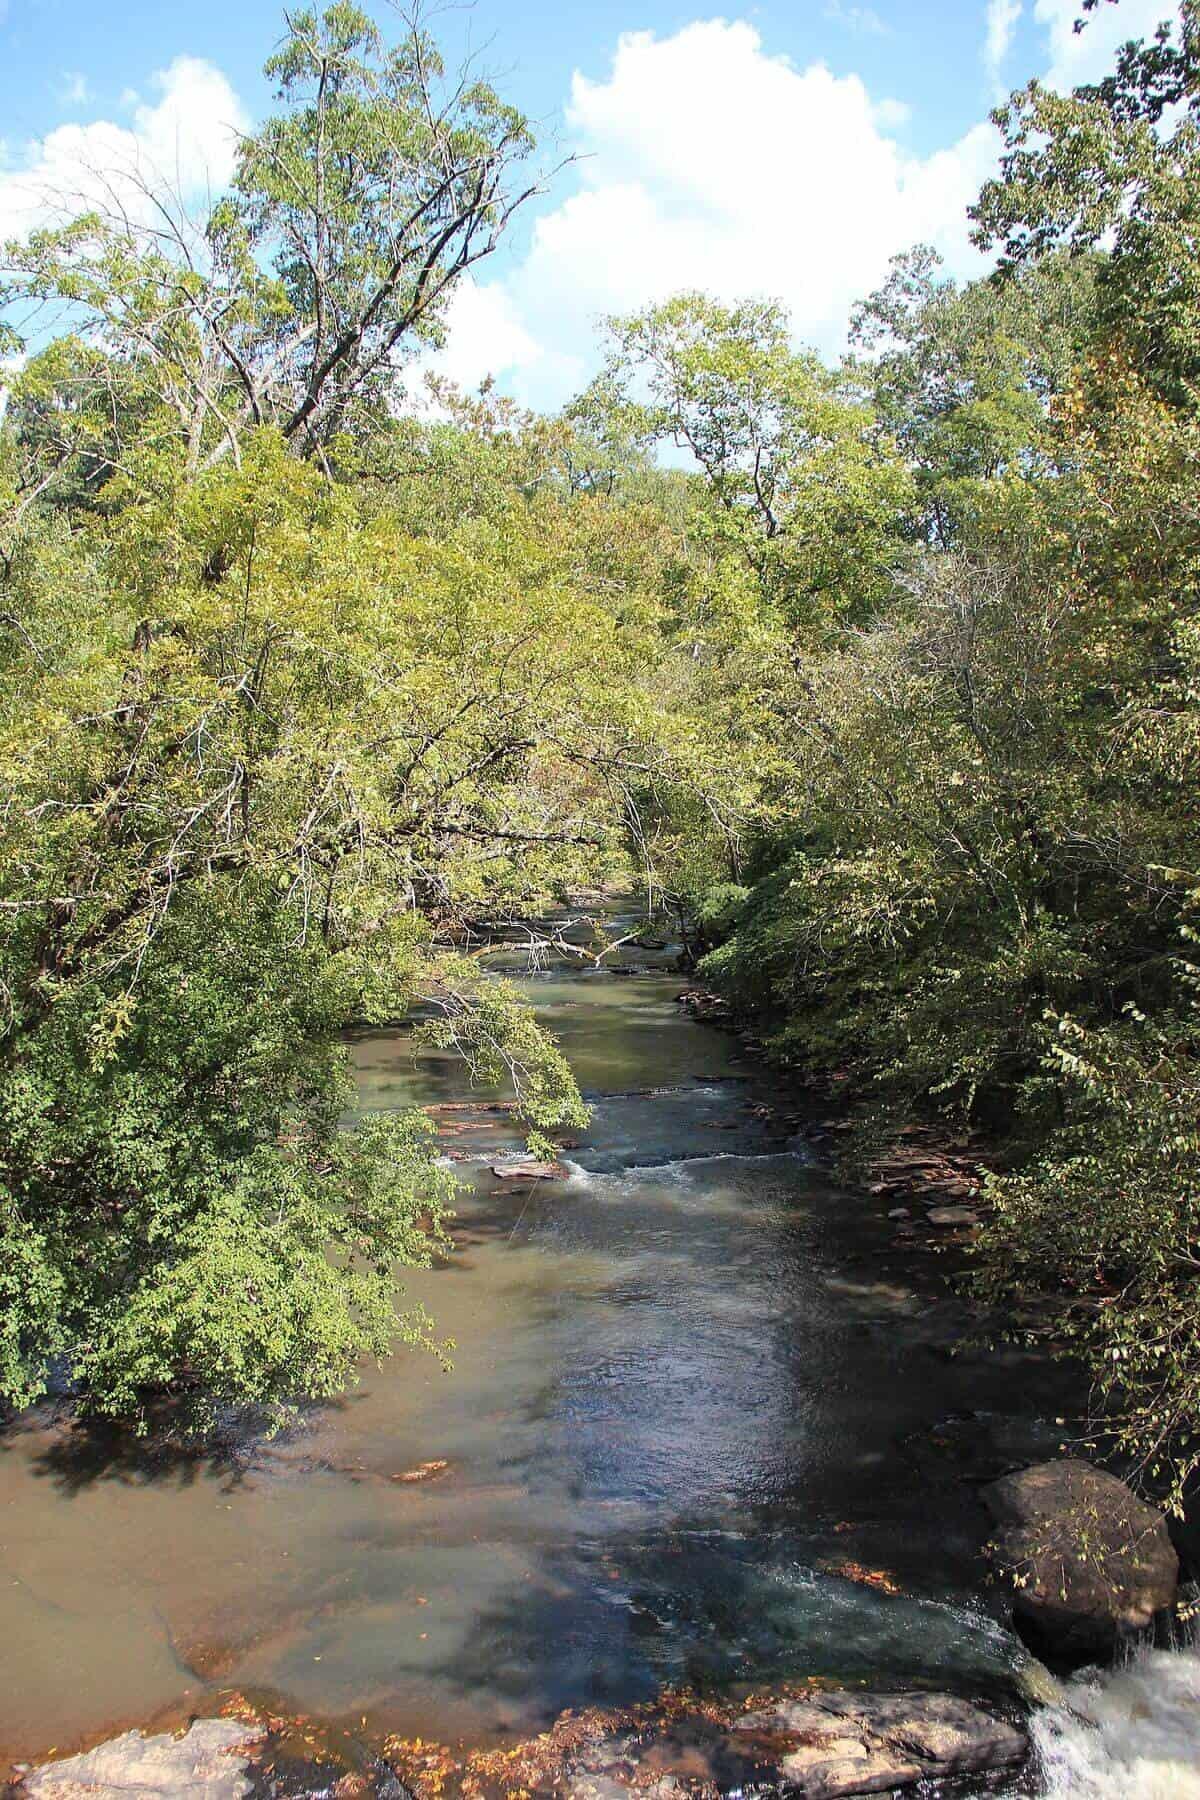 Vickery Creek in Roswell, Georgia